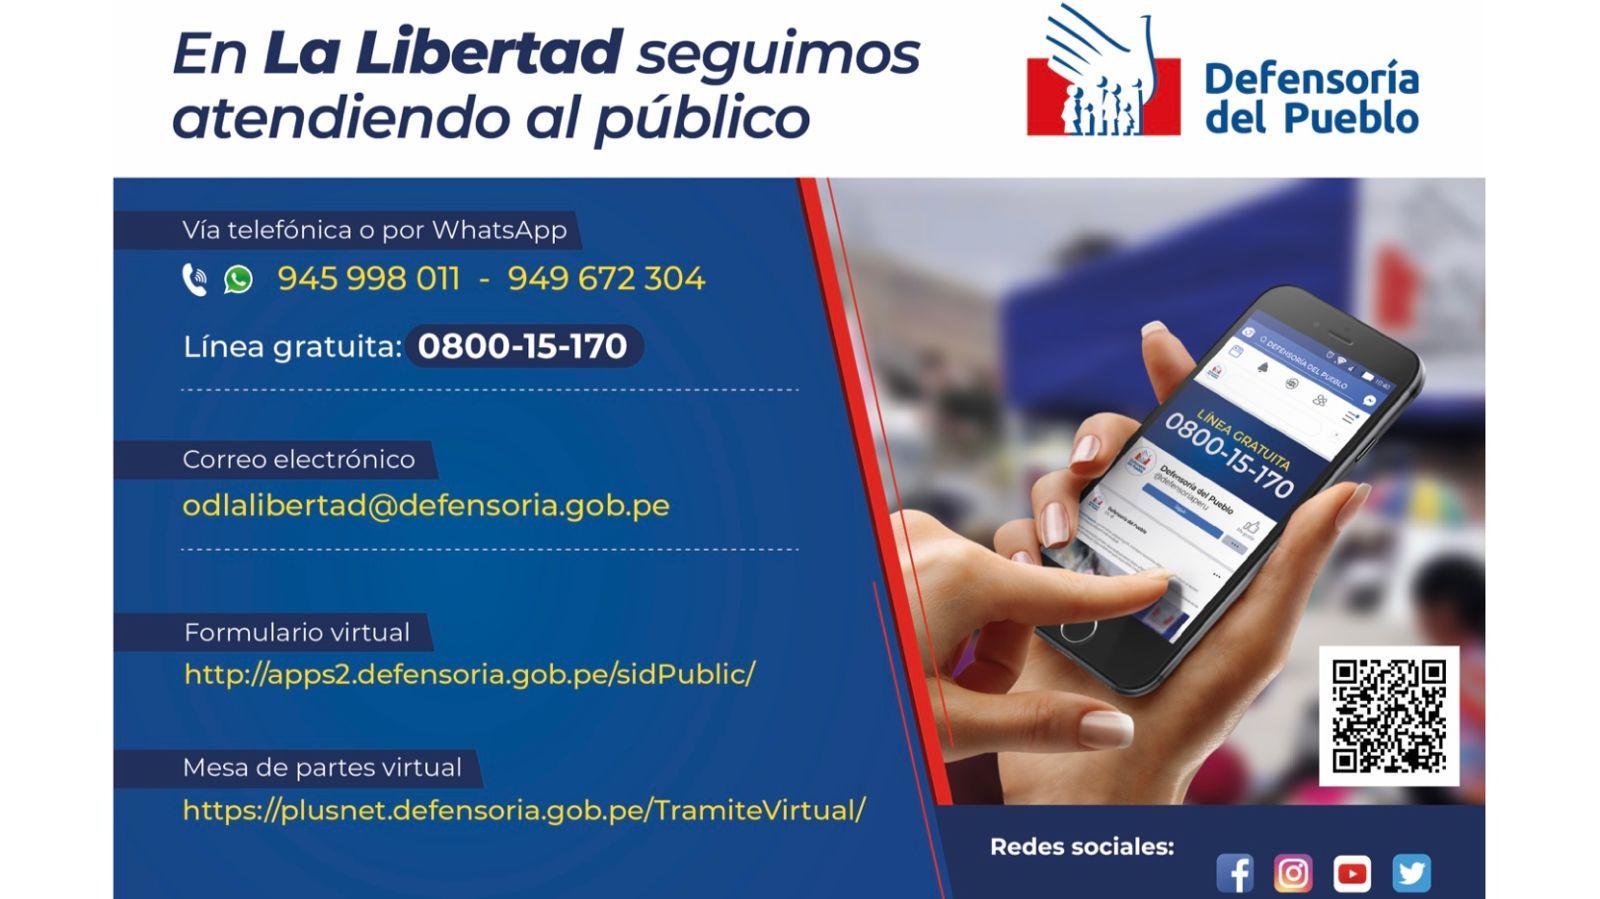 Línea gratuita 0800-15170 TELÉFONOS: 945998011 / 949672304 CORREO: odlalibertad@defensoria.gob.pe Formulario virtual: http://apps2.defensoria.gob.pe/sidPublic/ Mesa de partes: http://plusnet.defensoria.gob.pe/TramiteVirtual/